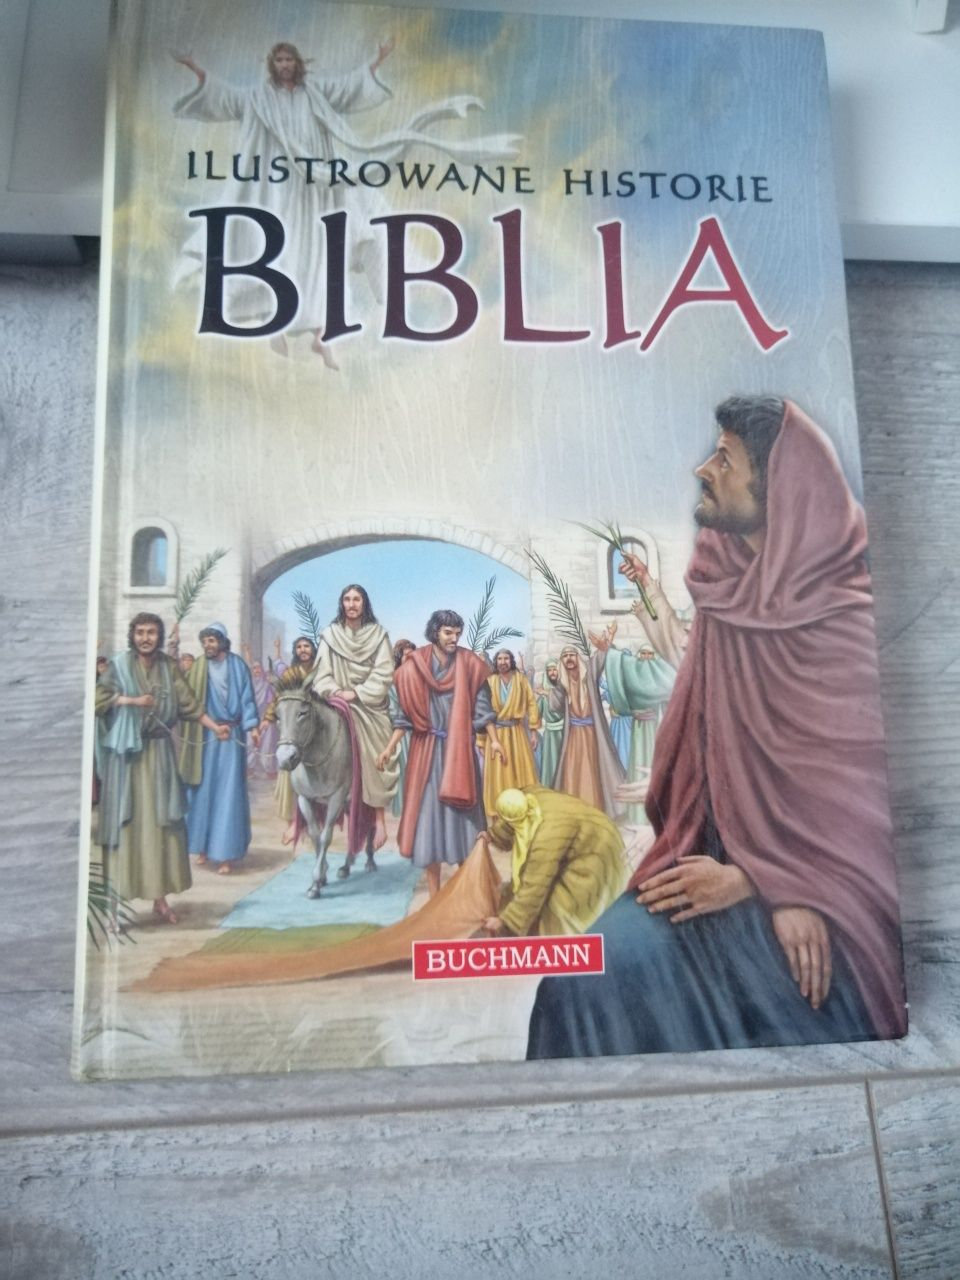 Biblia, ilustrowane historie